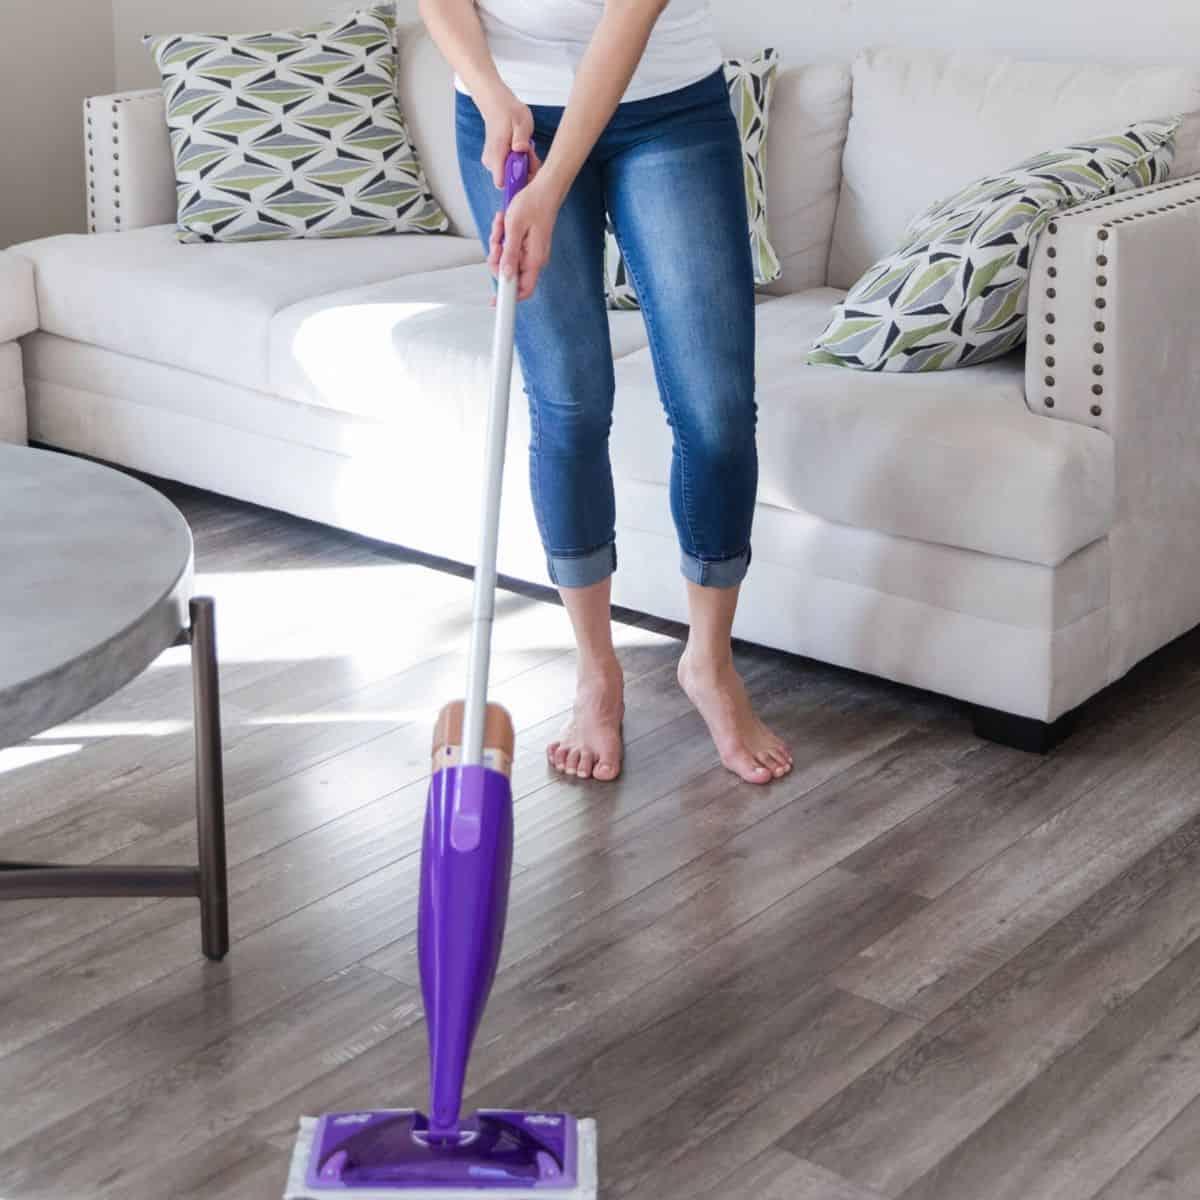 spring cleaning tips tricks hacks